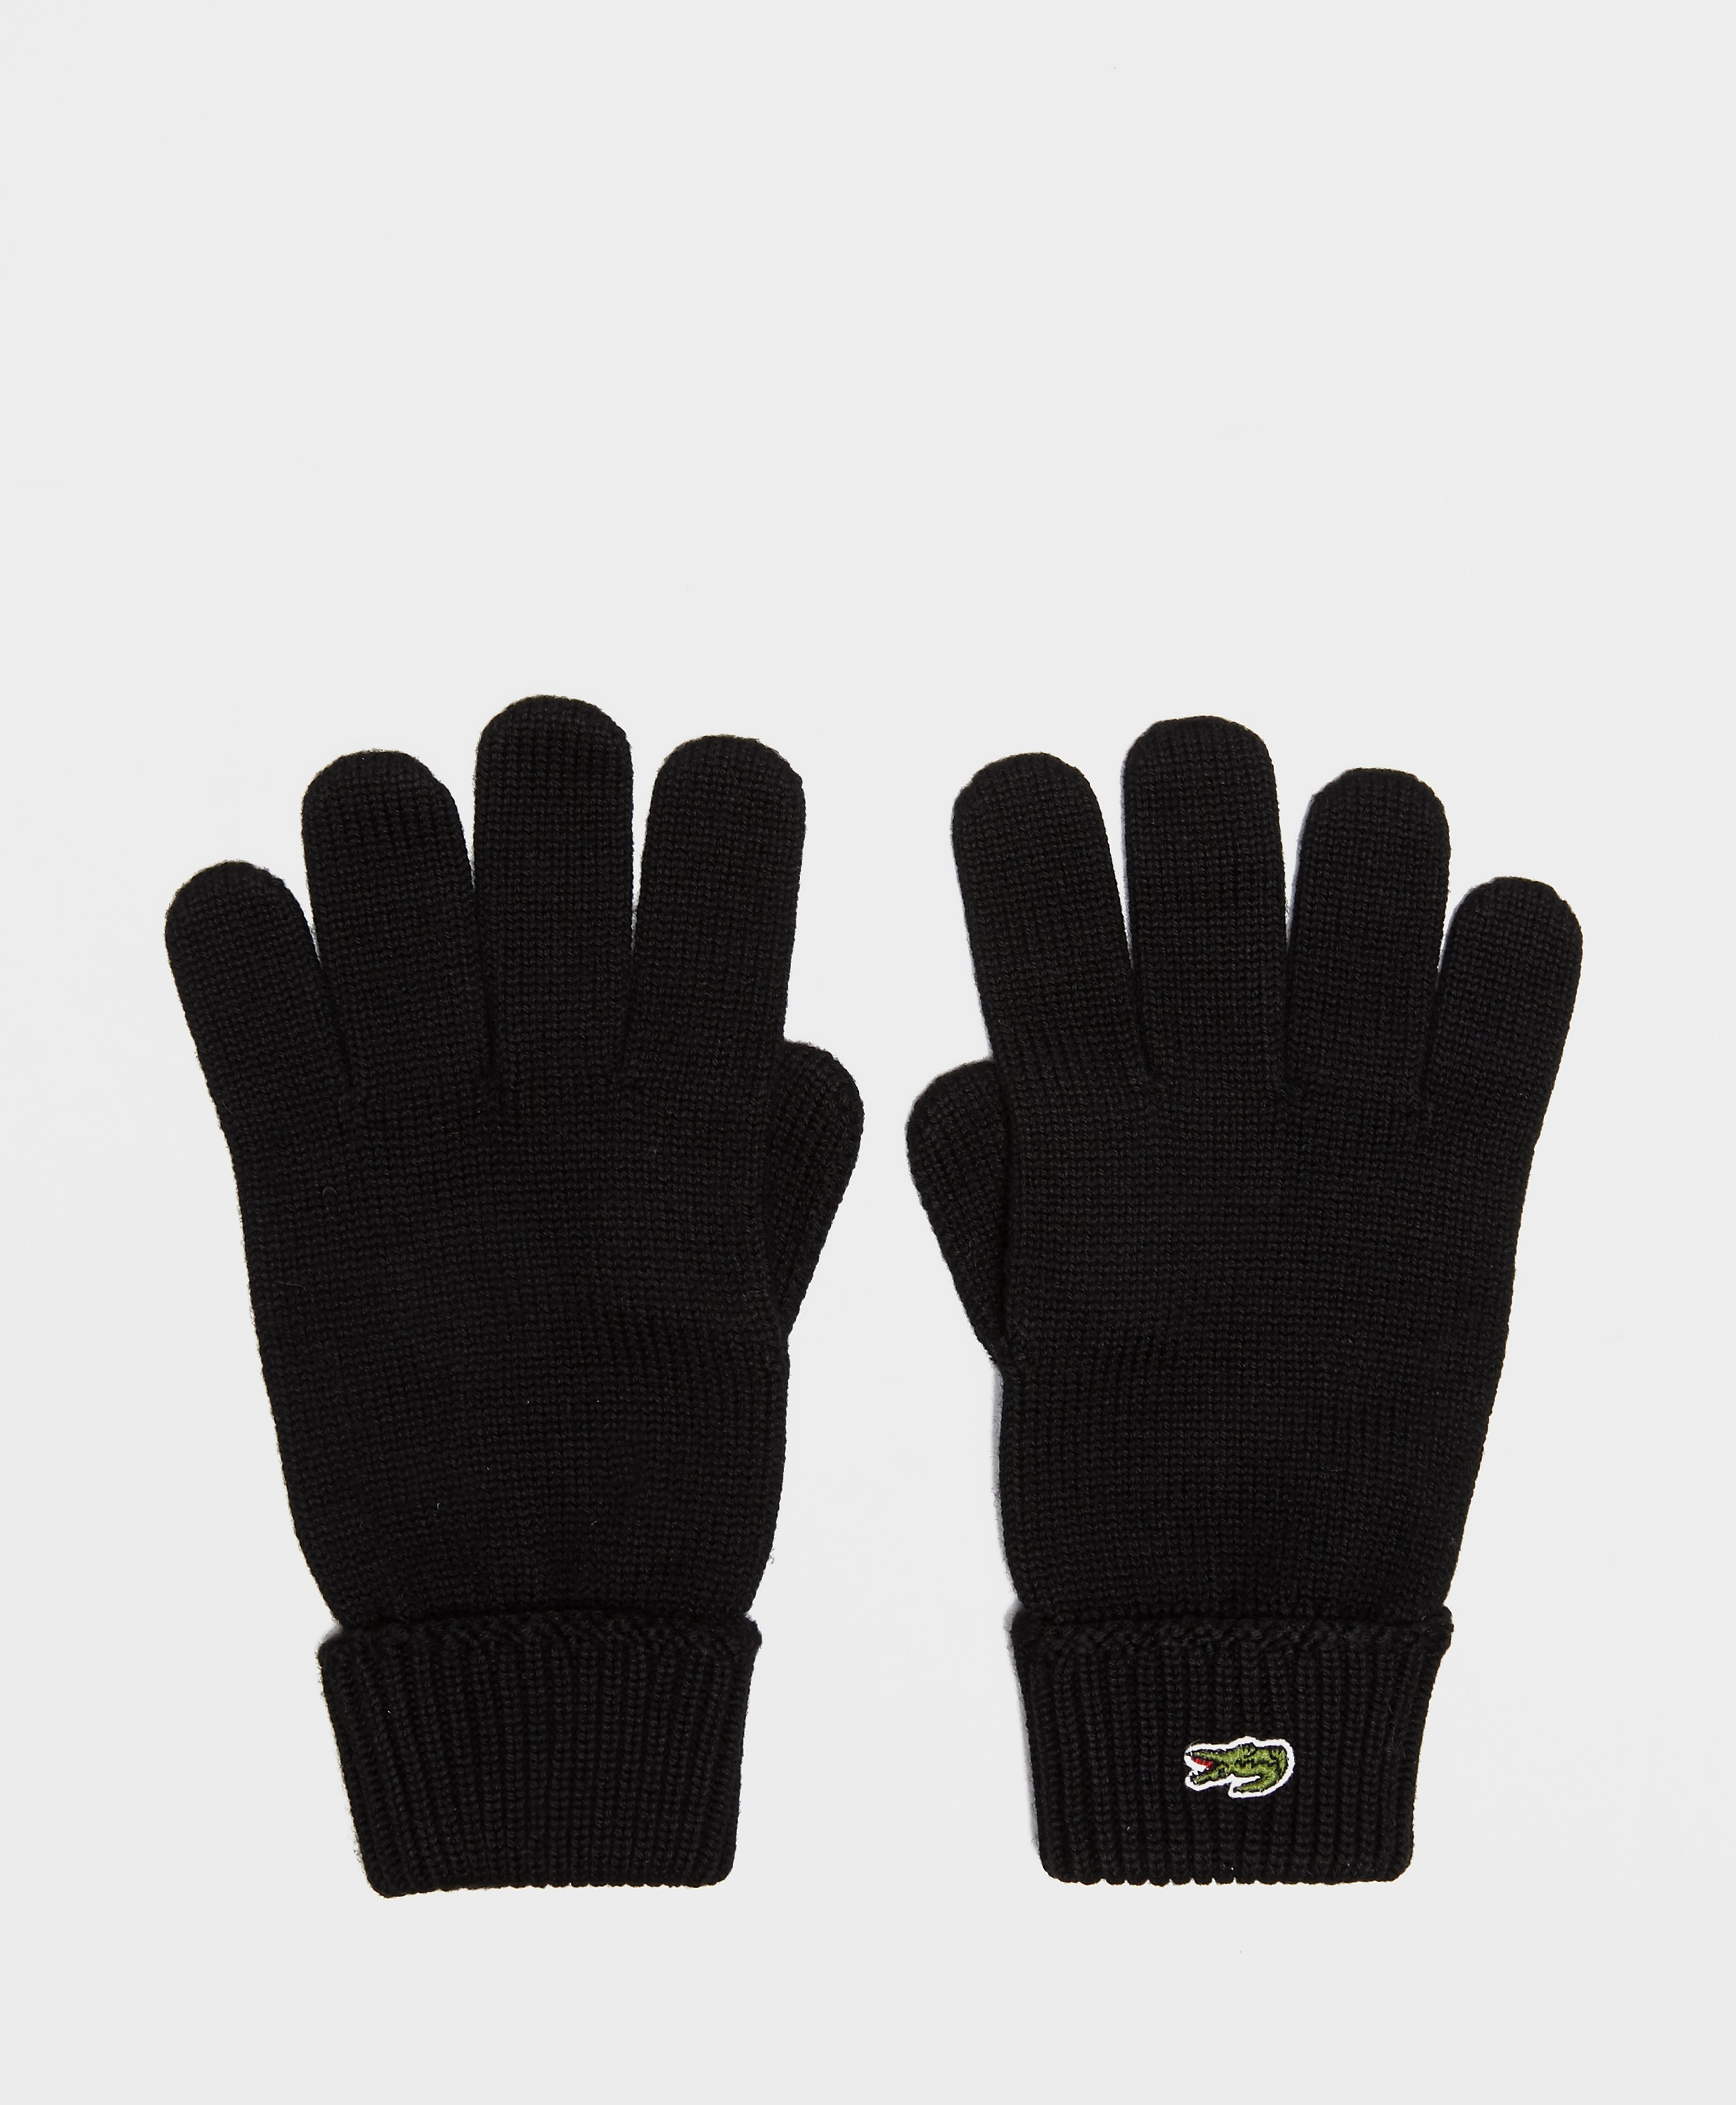 Lacoste Crocodile Ski Gloves